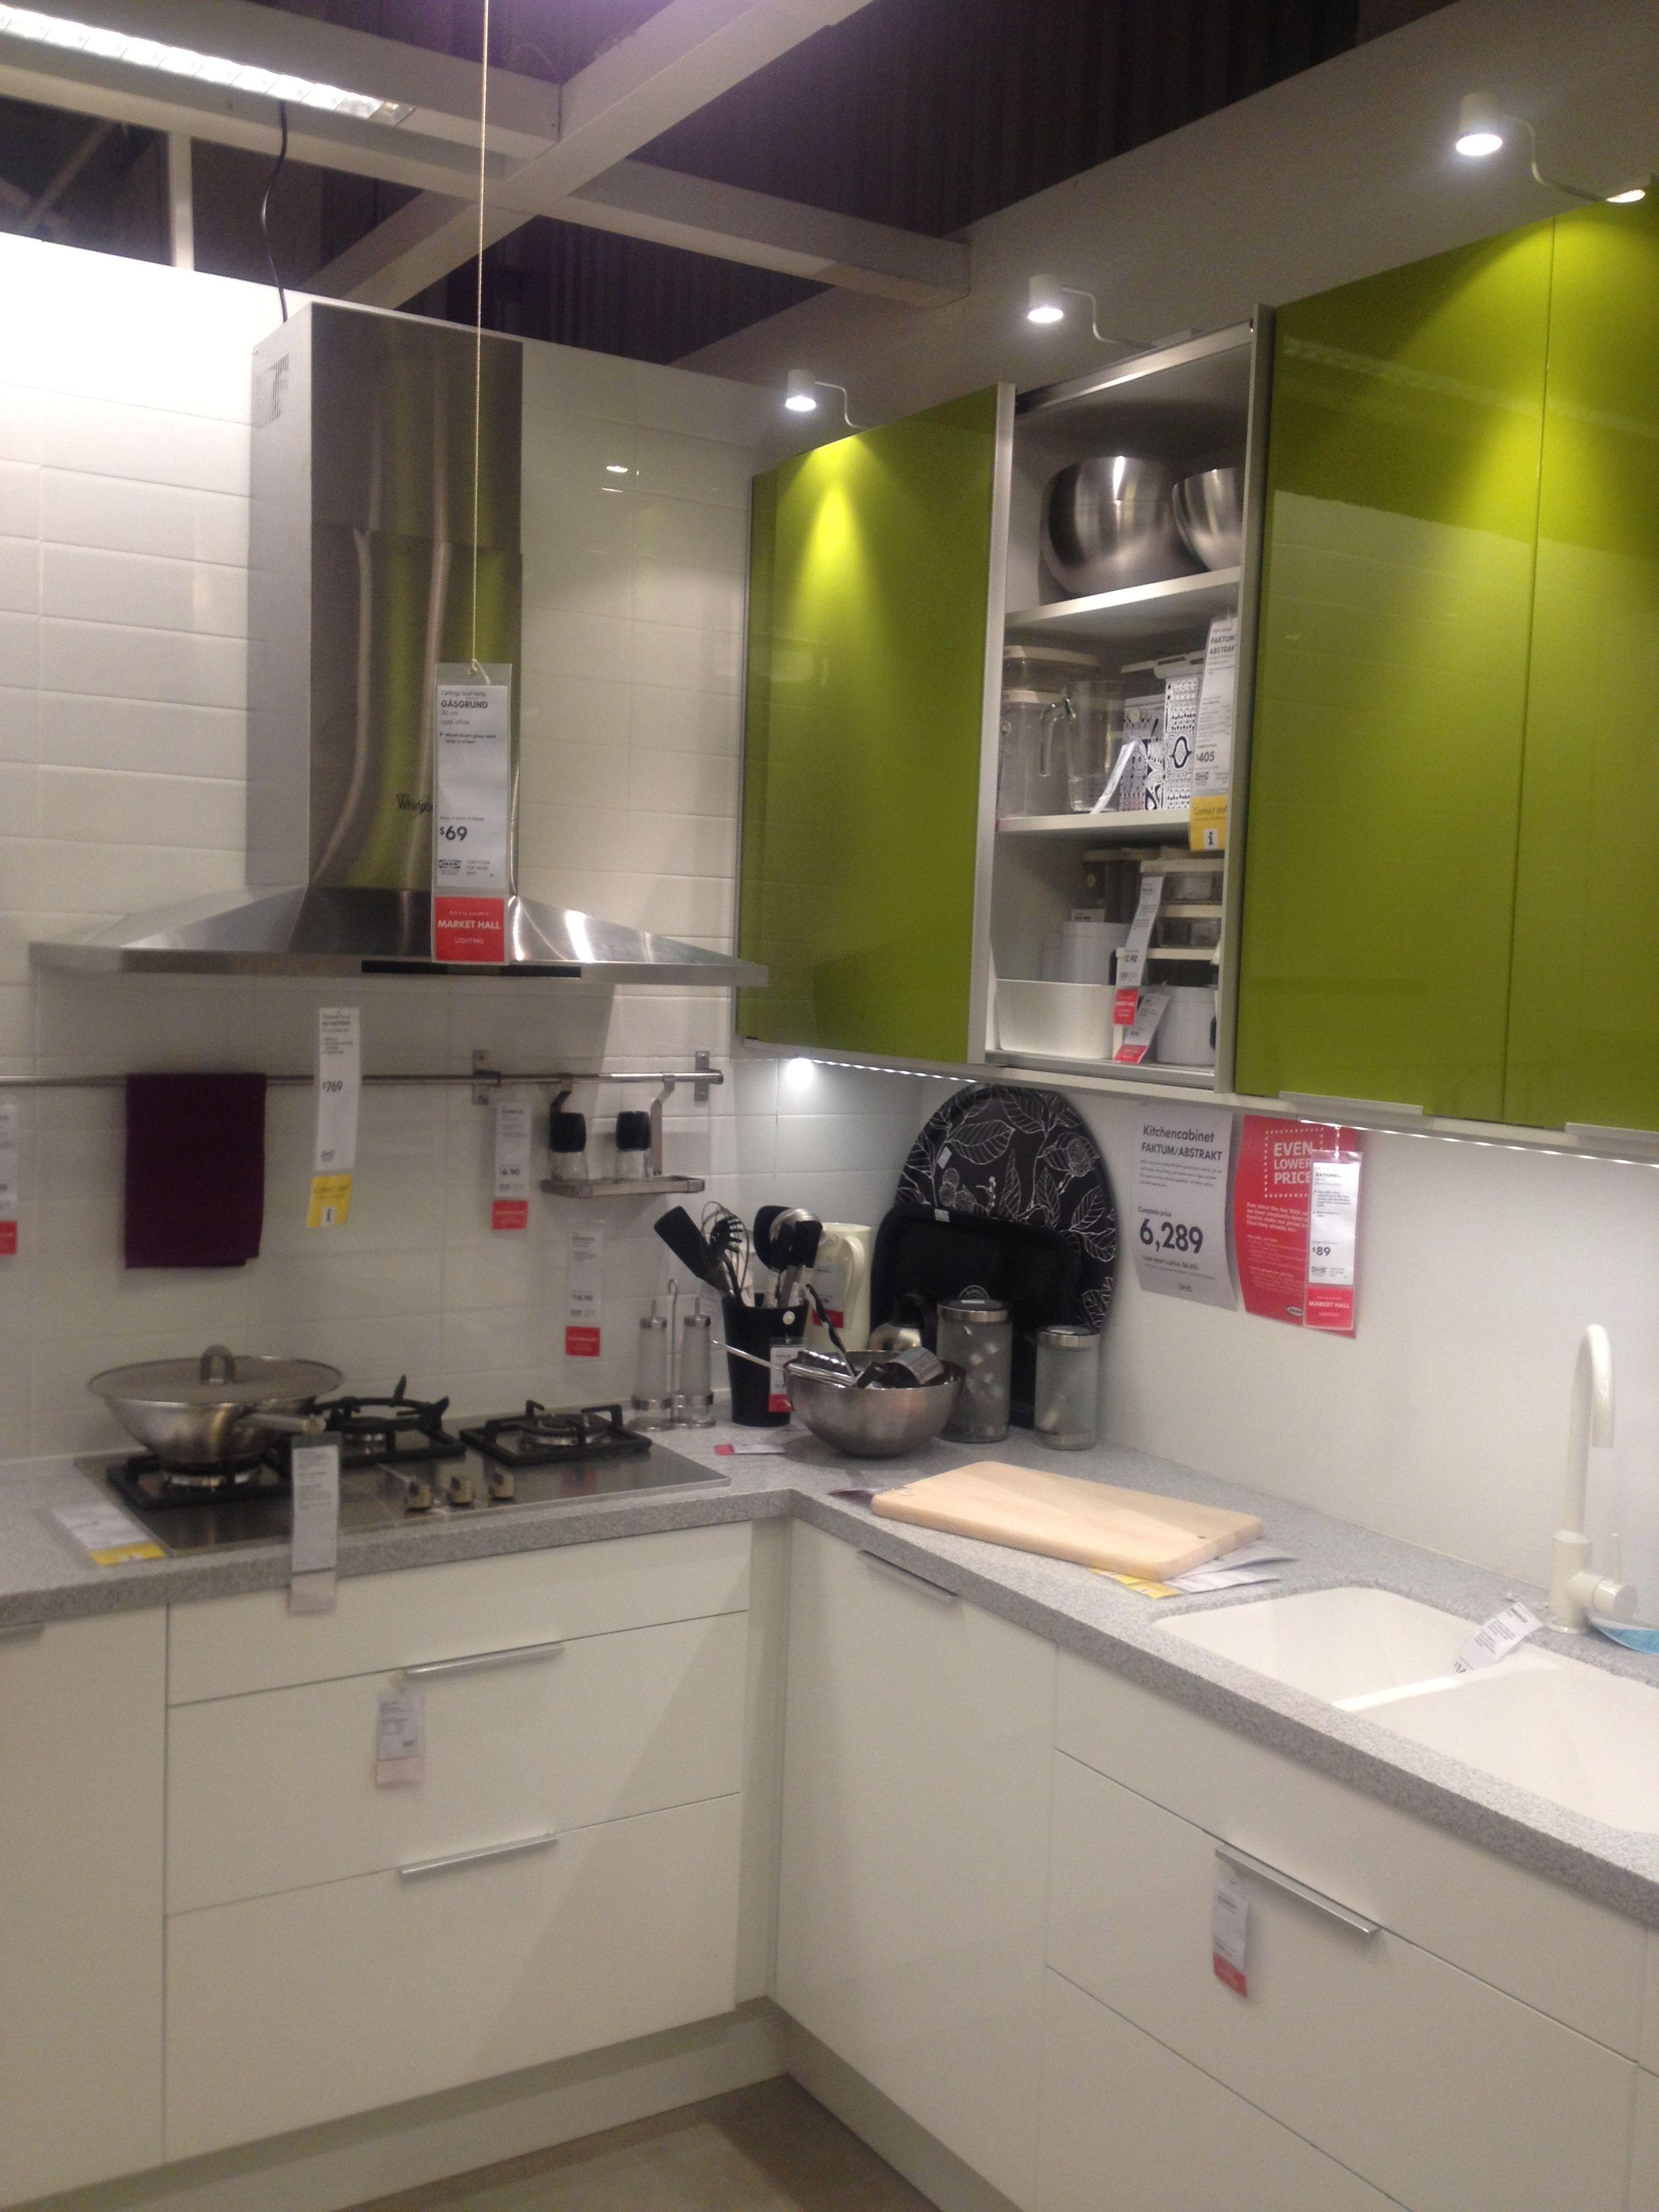 Virtual Kitchen Design Hdb Singapore: IKEA Kitchen For Hdb 4 Room